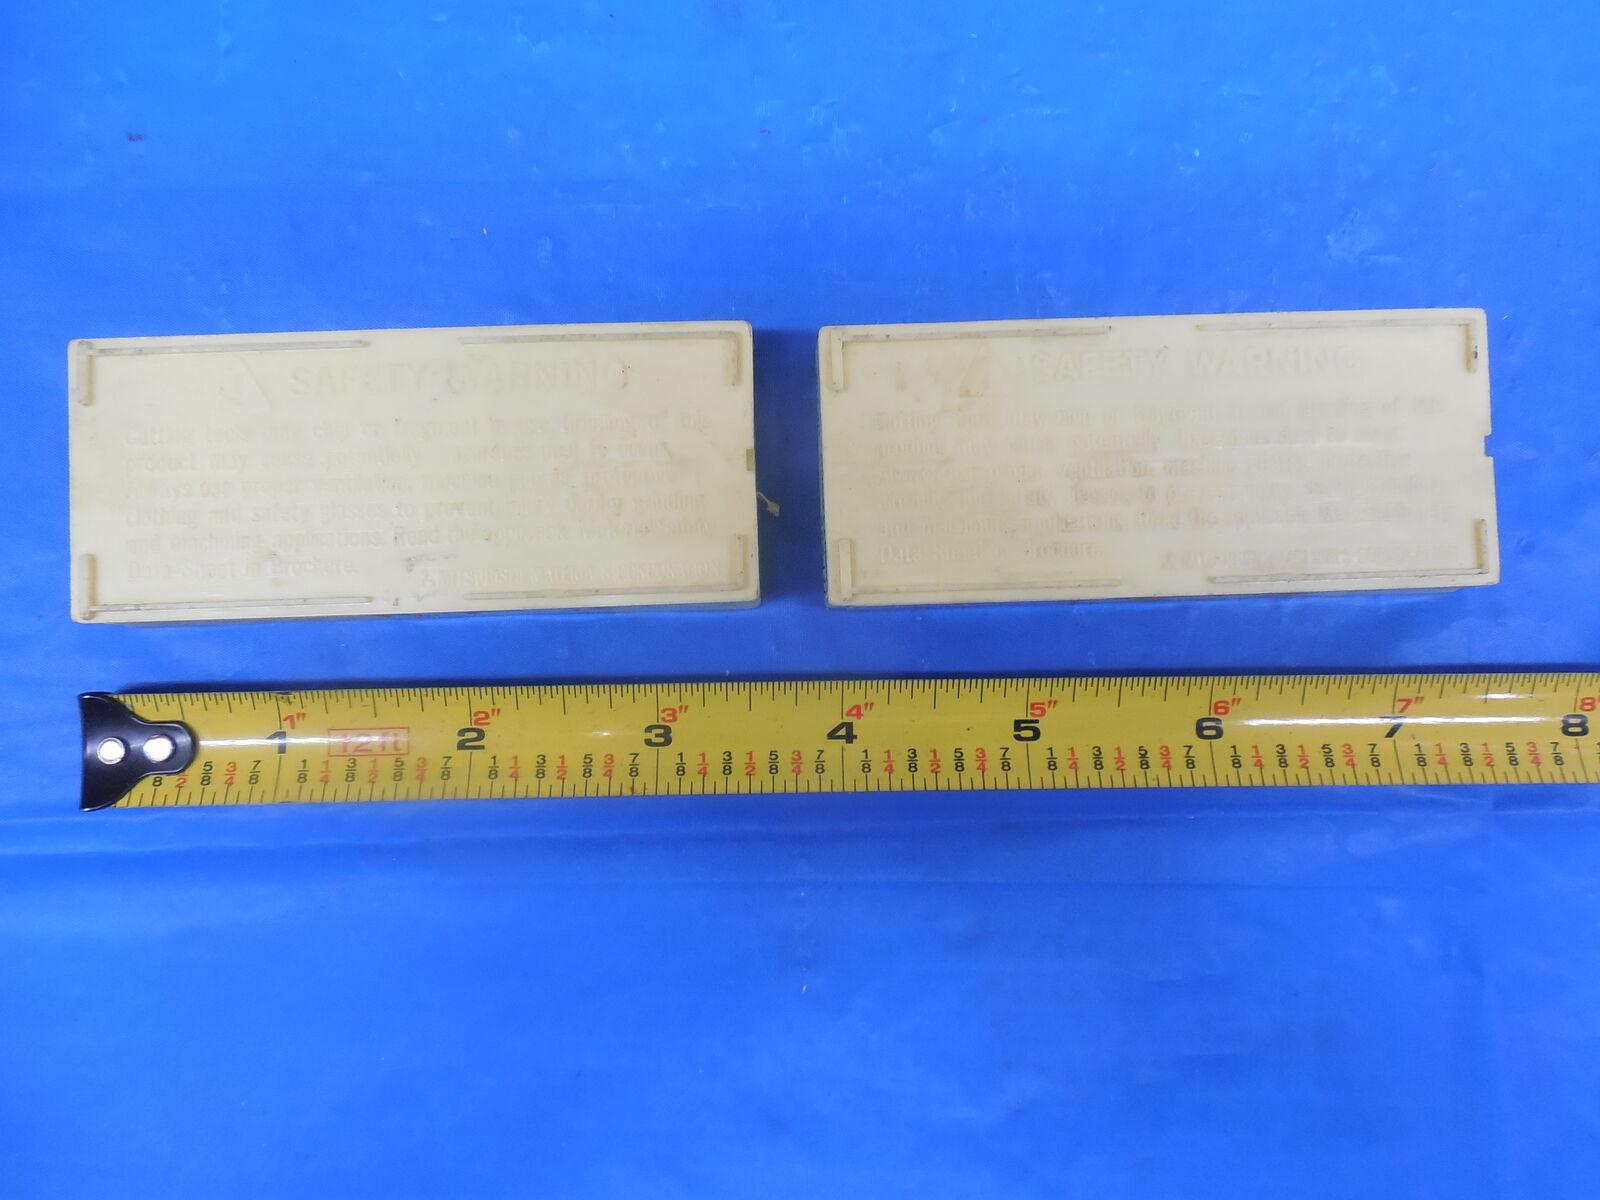 Solid Carbide T Slot Keyseat End Mill Milling Cutter Dia 3mm Slot Width 3.0mm